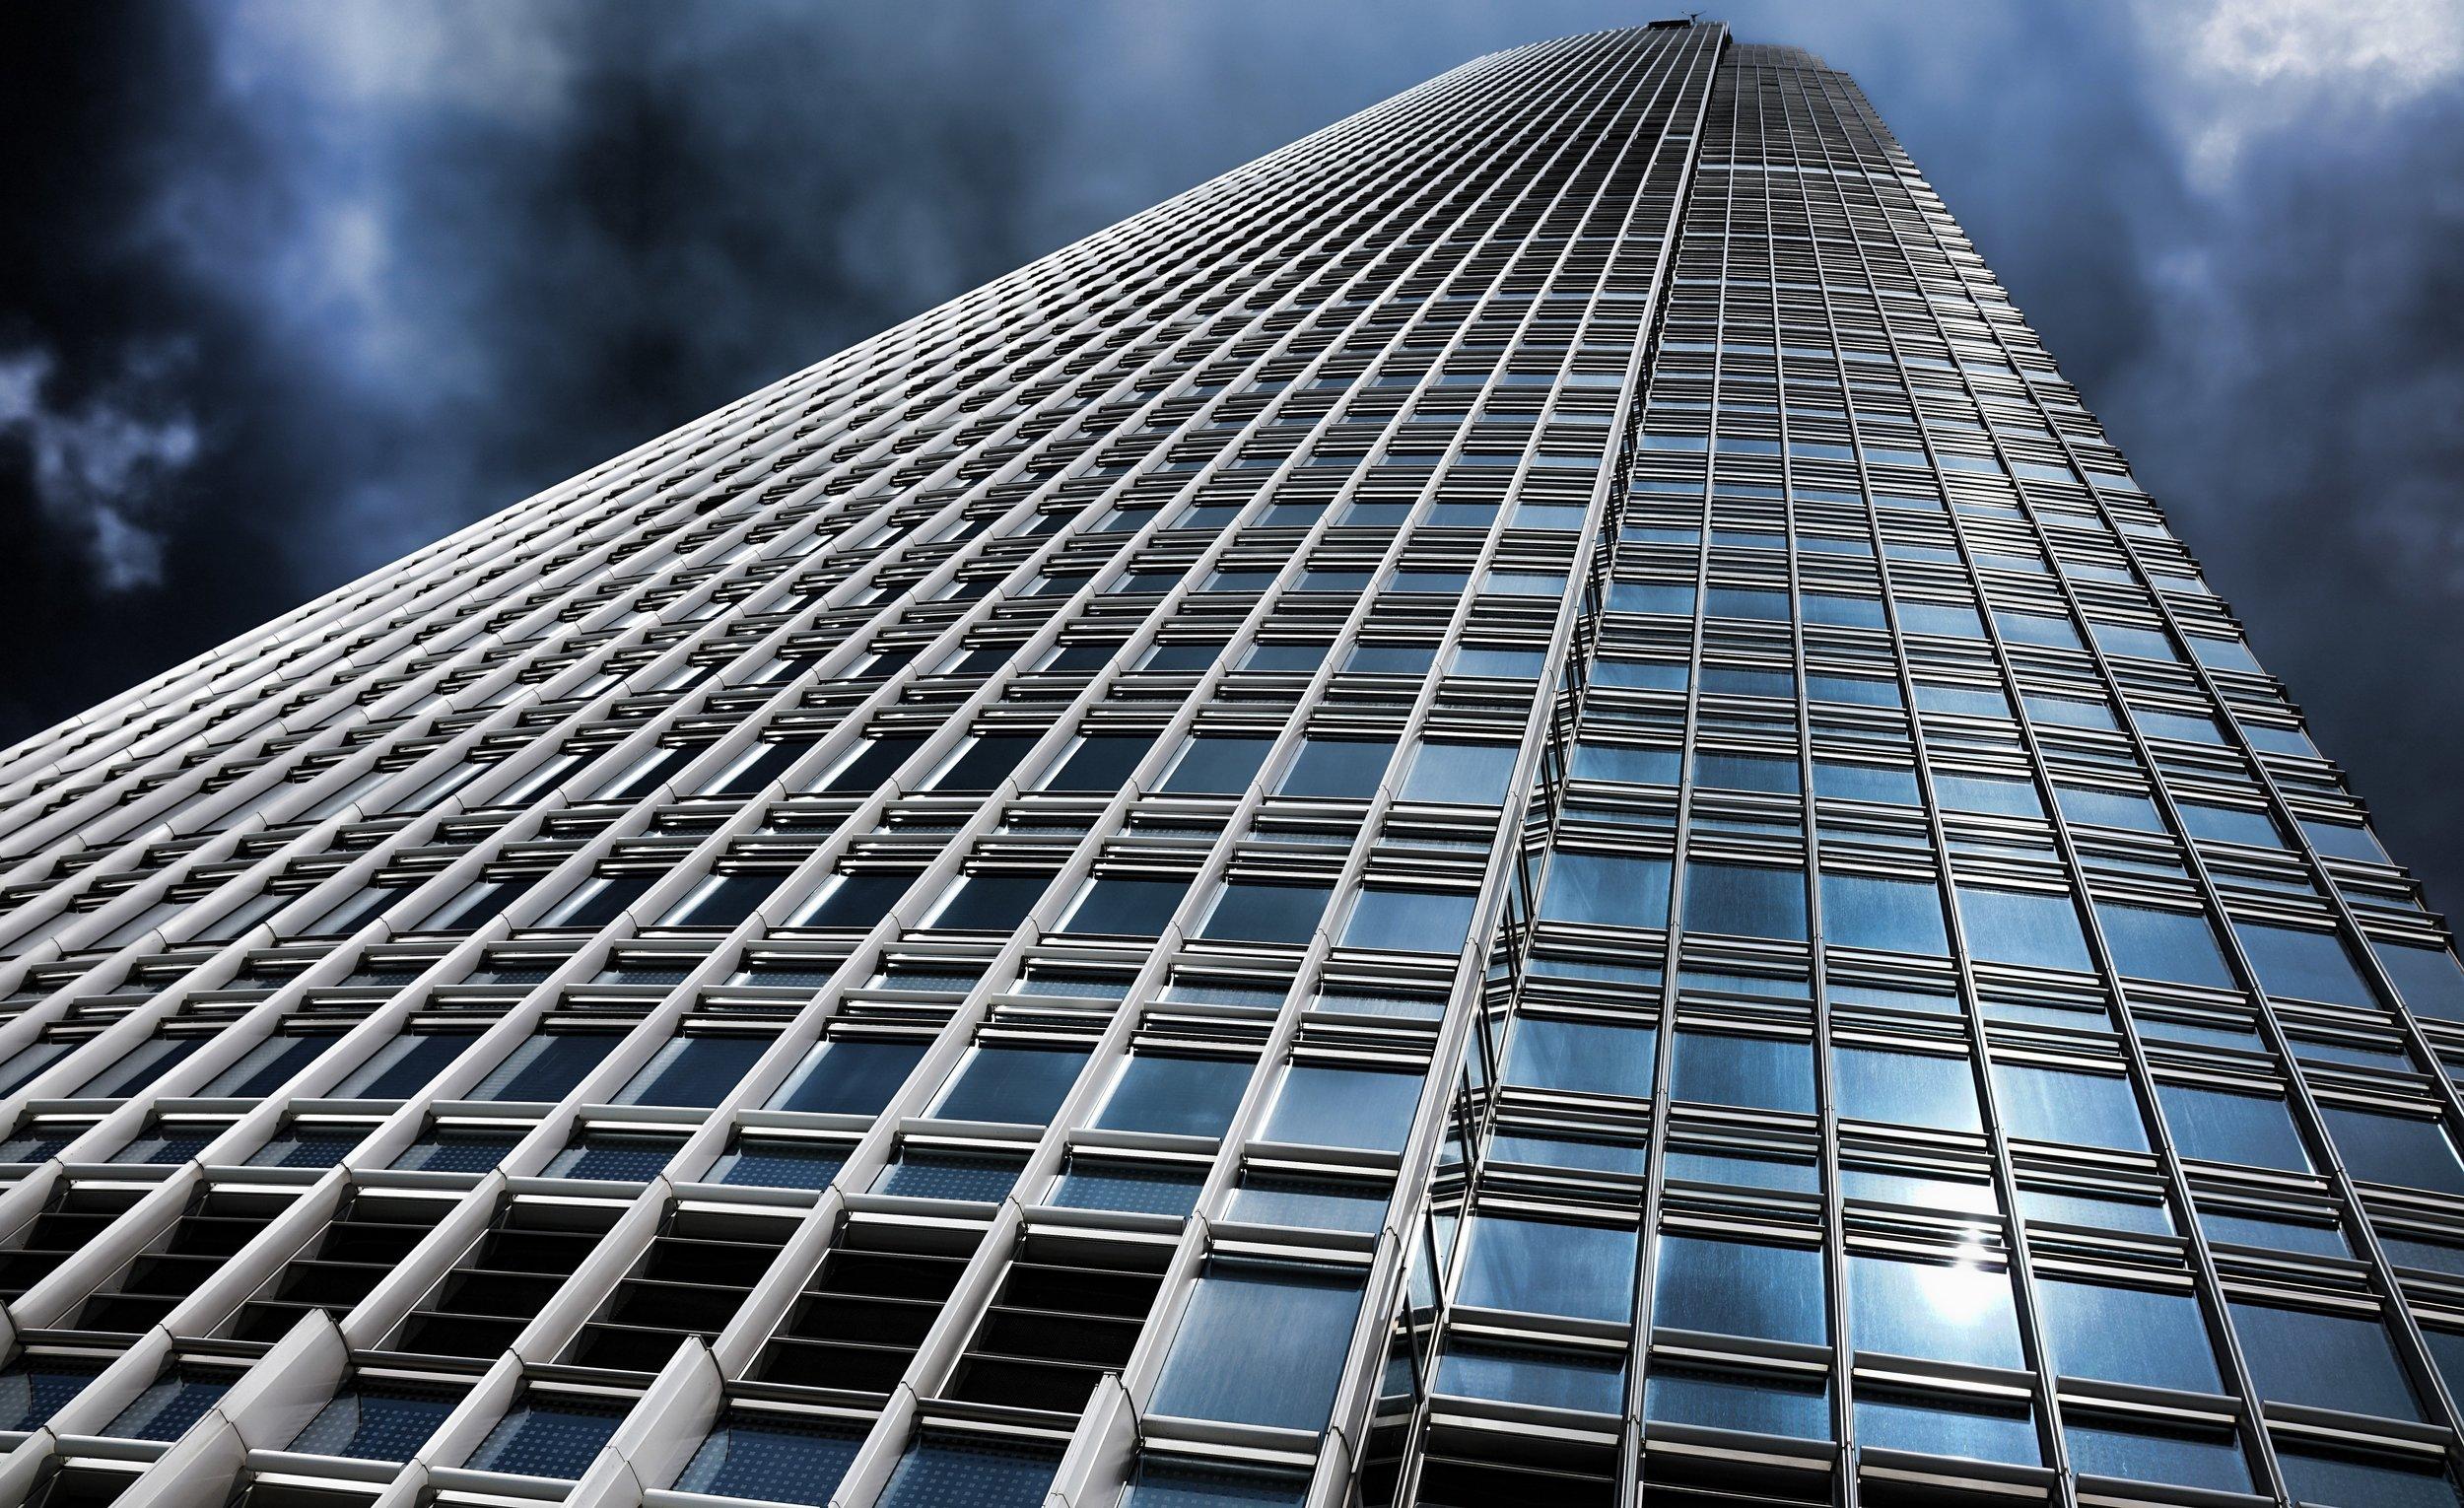 IFC 2, 88 Floor Skyscraper, Hong Kong.JPG